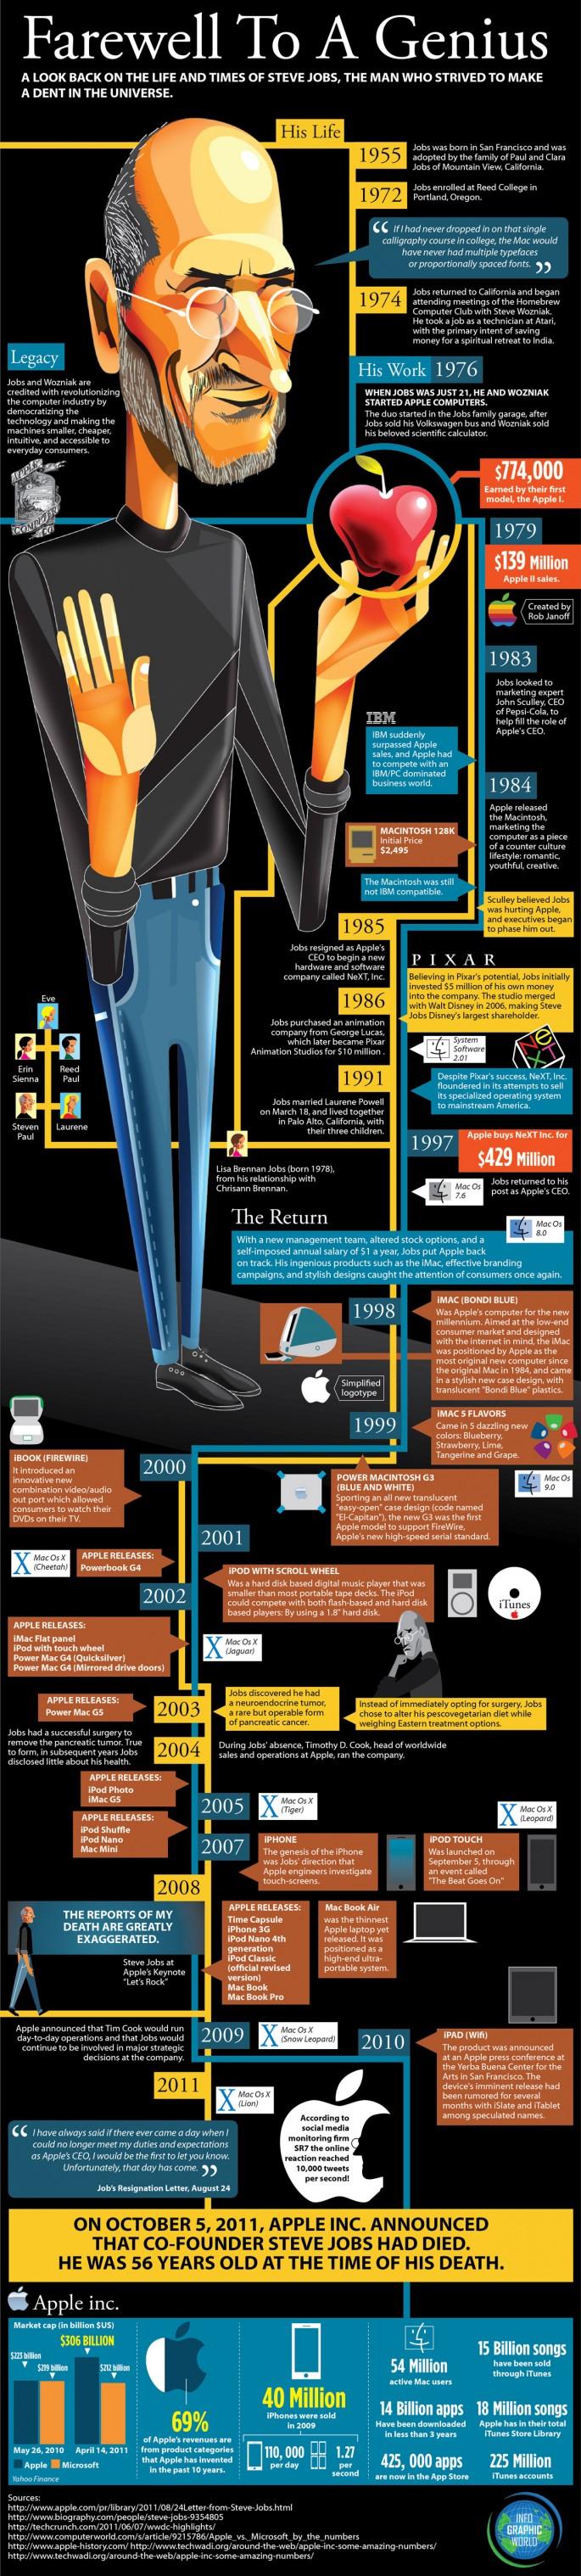 Steve Jobs Genius - Infographic